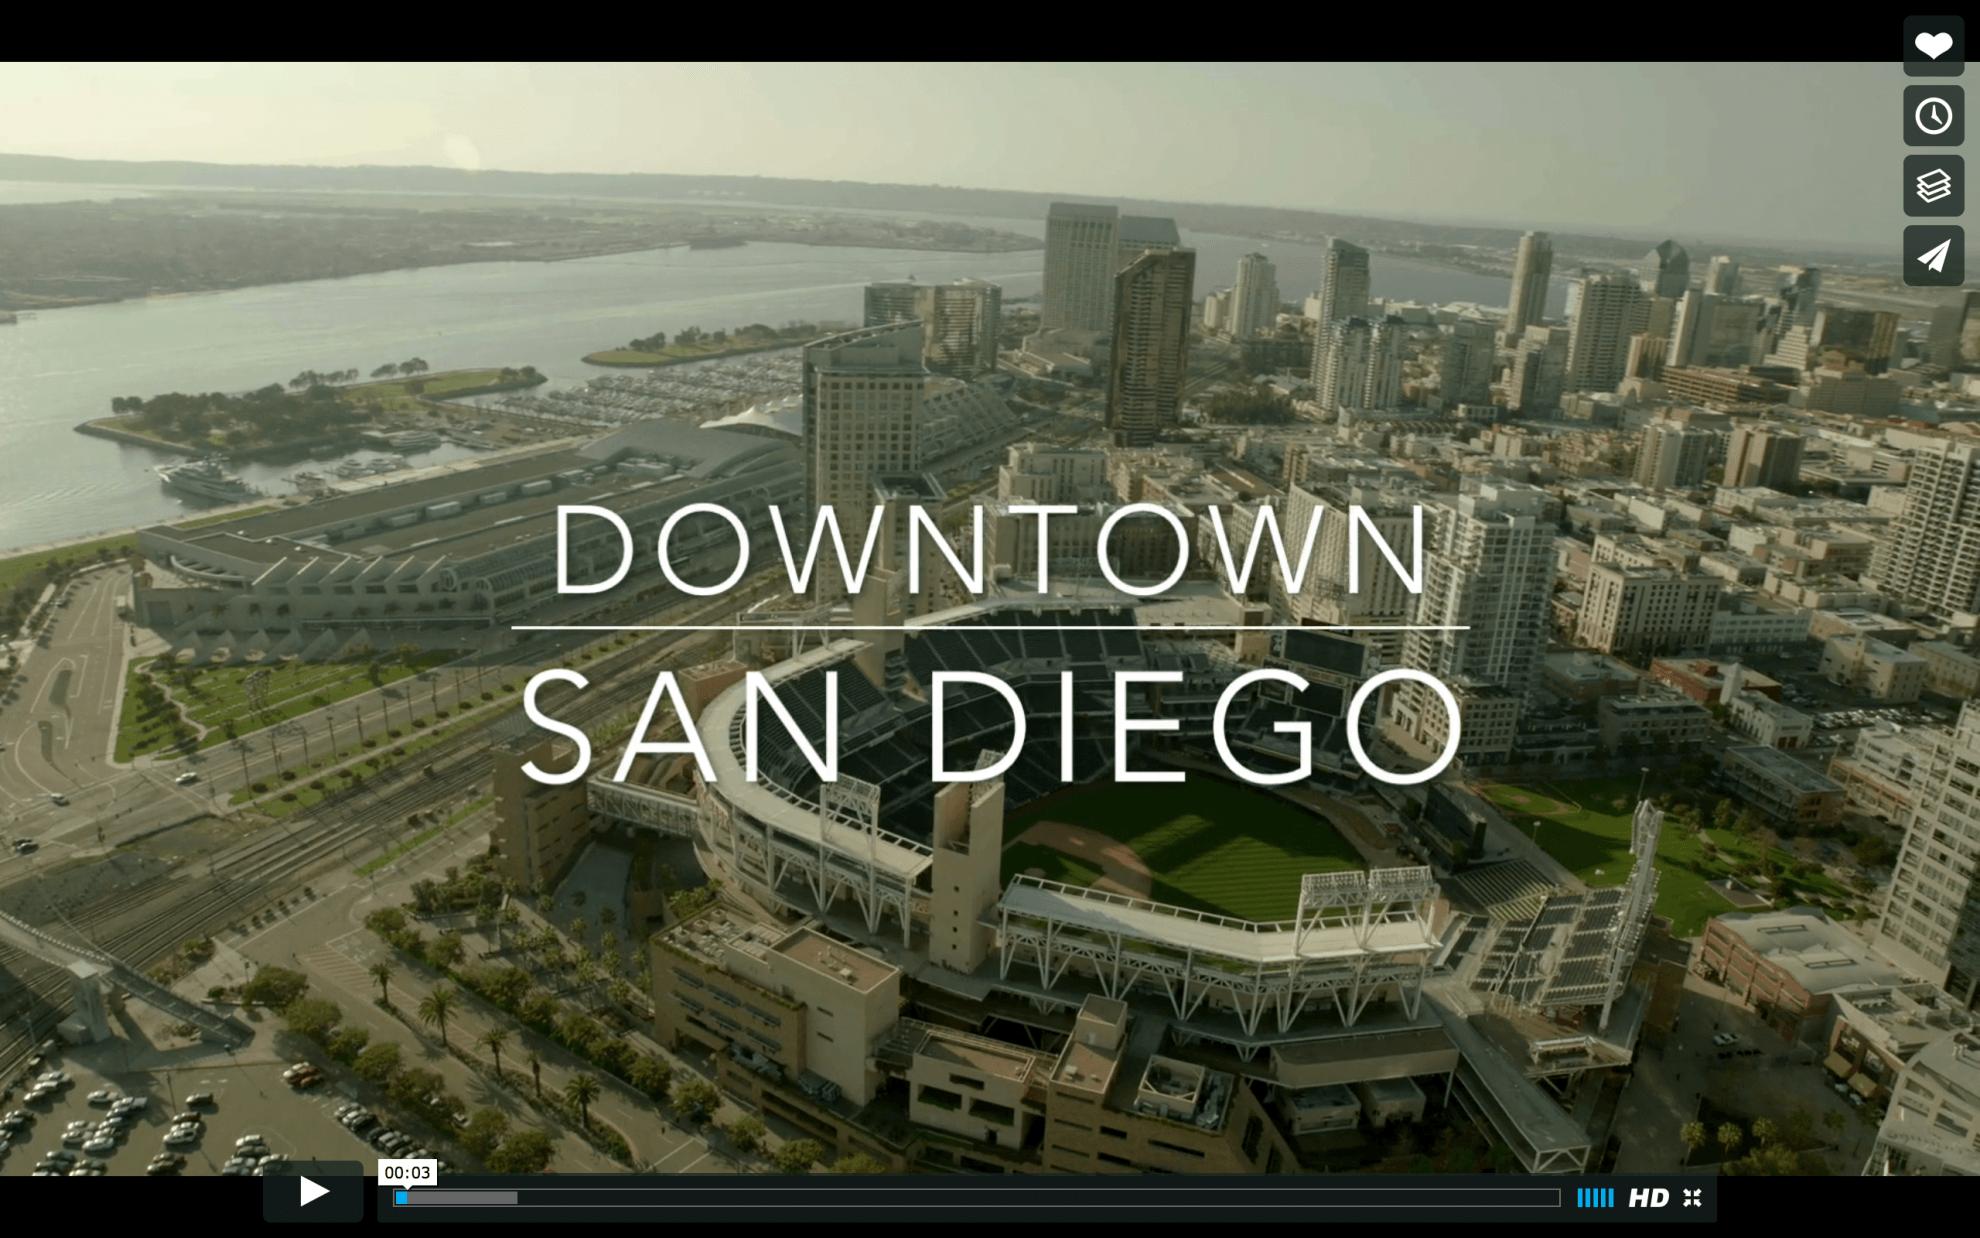 Downtown San Diego Aerial Photo